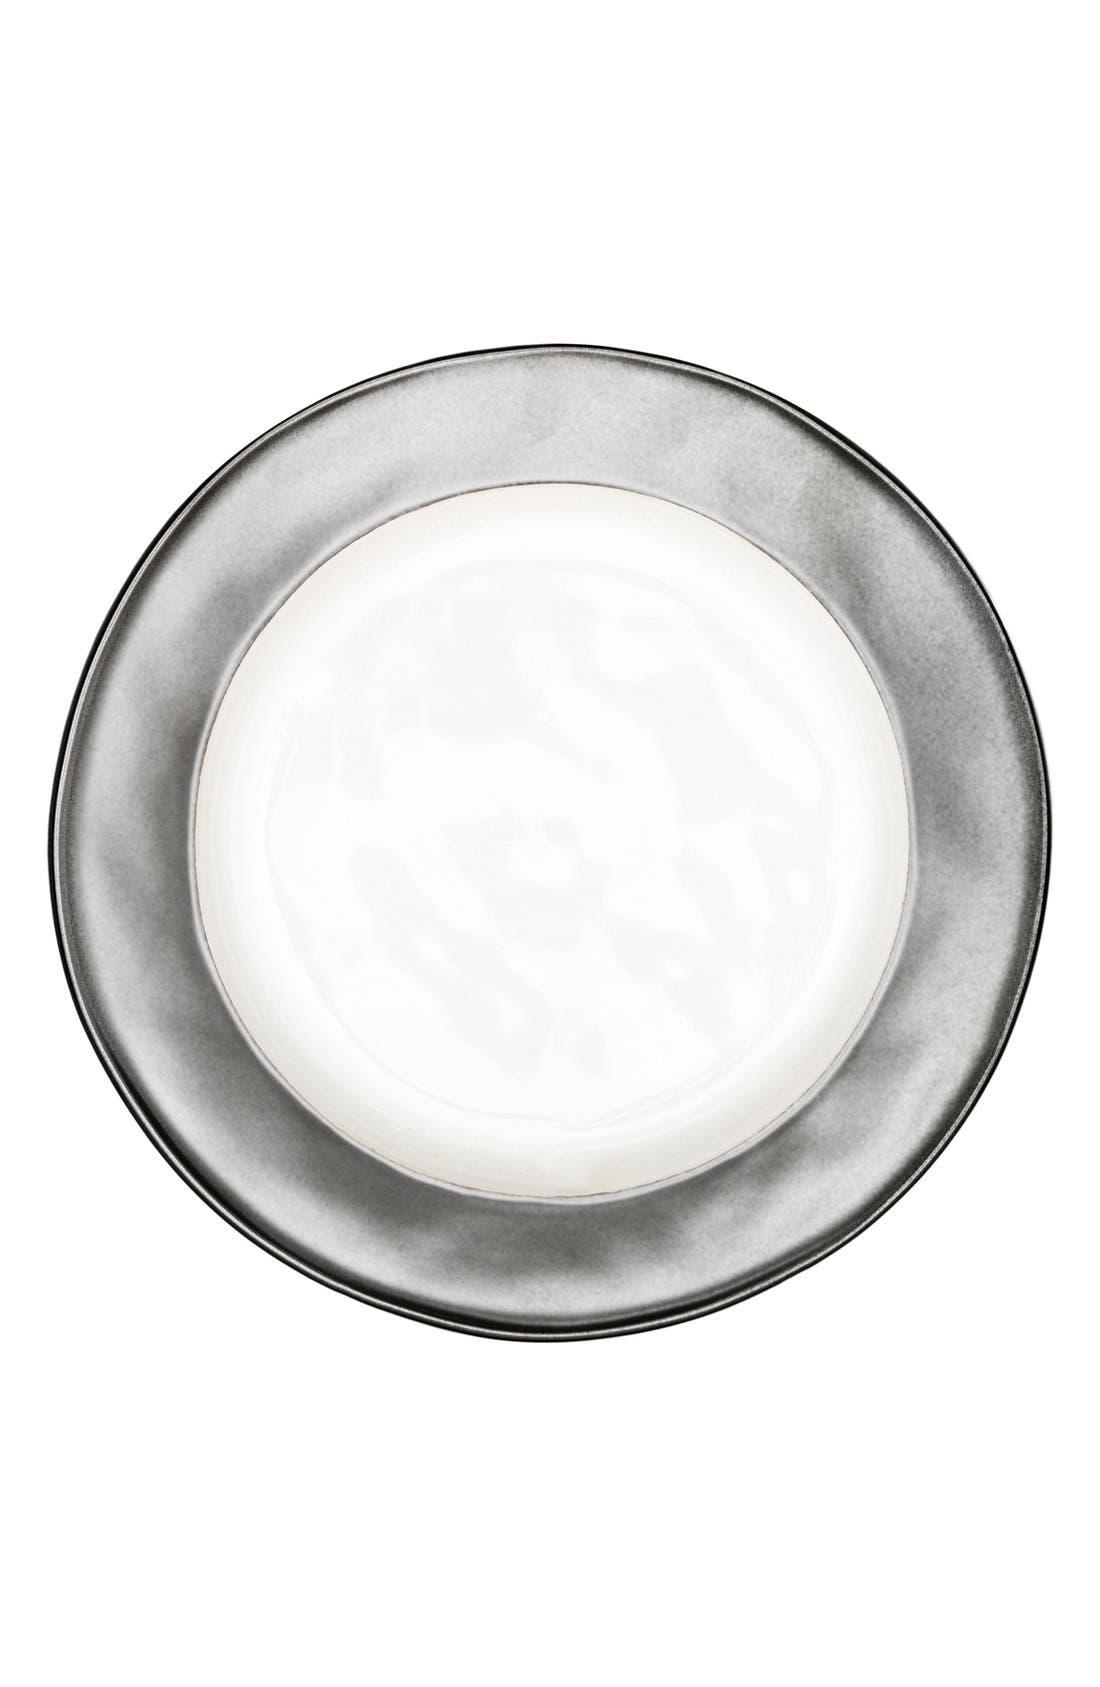 'Emerson' Ceramic Dessert Plate,                         Main,                         color, Pewter/ White